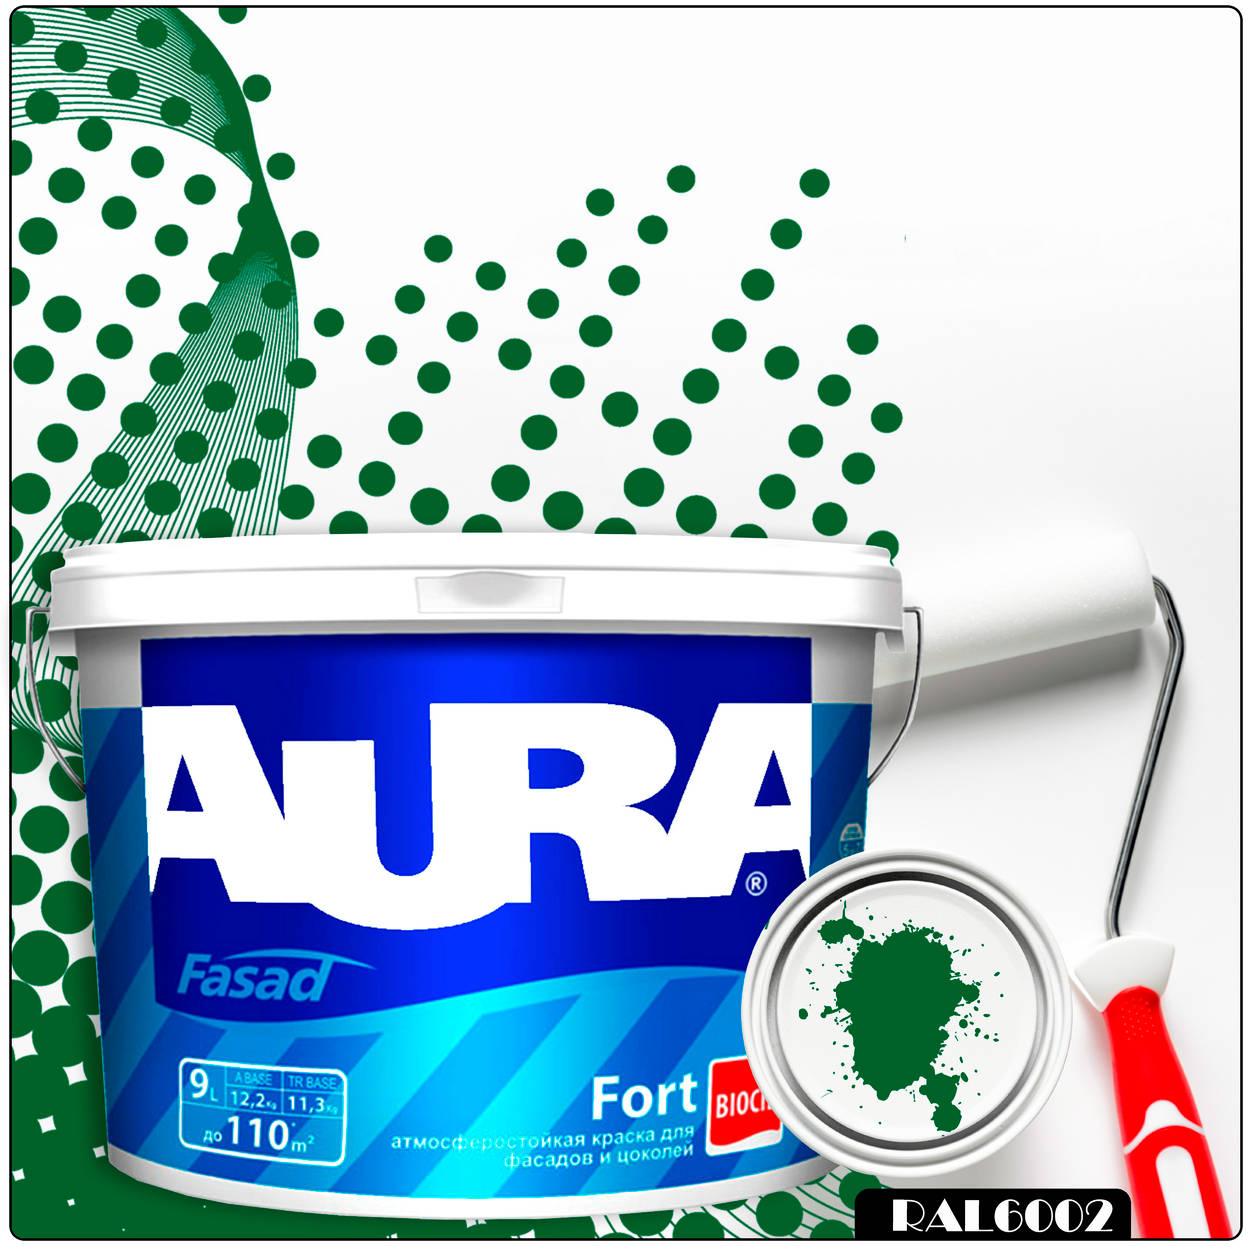 Фото 3 - Краска Aura Fasad Fort, RAL 6002 Зеленый лист, латексная, матовая, для фасада и цоколей, 9л, Аура.